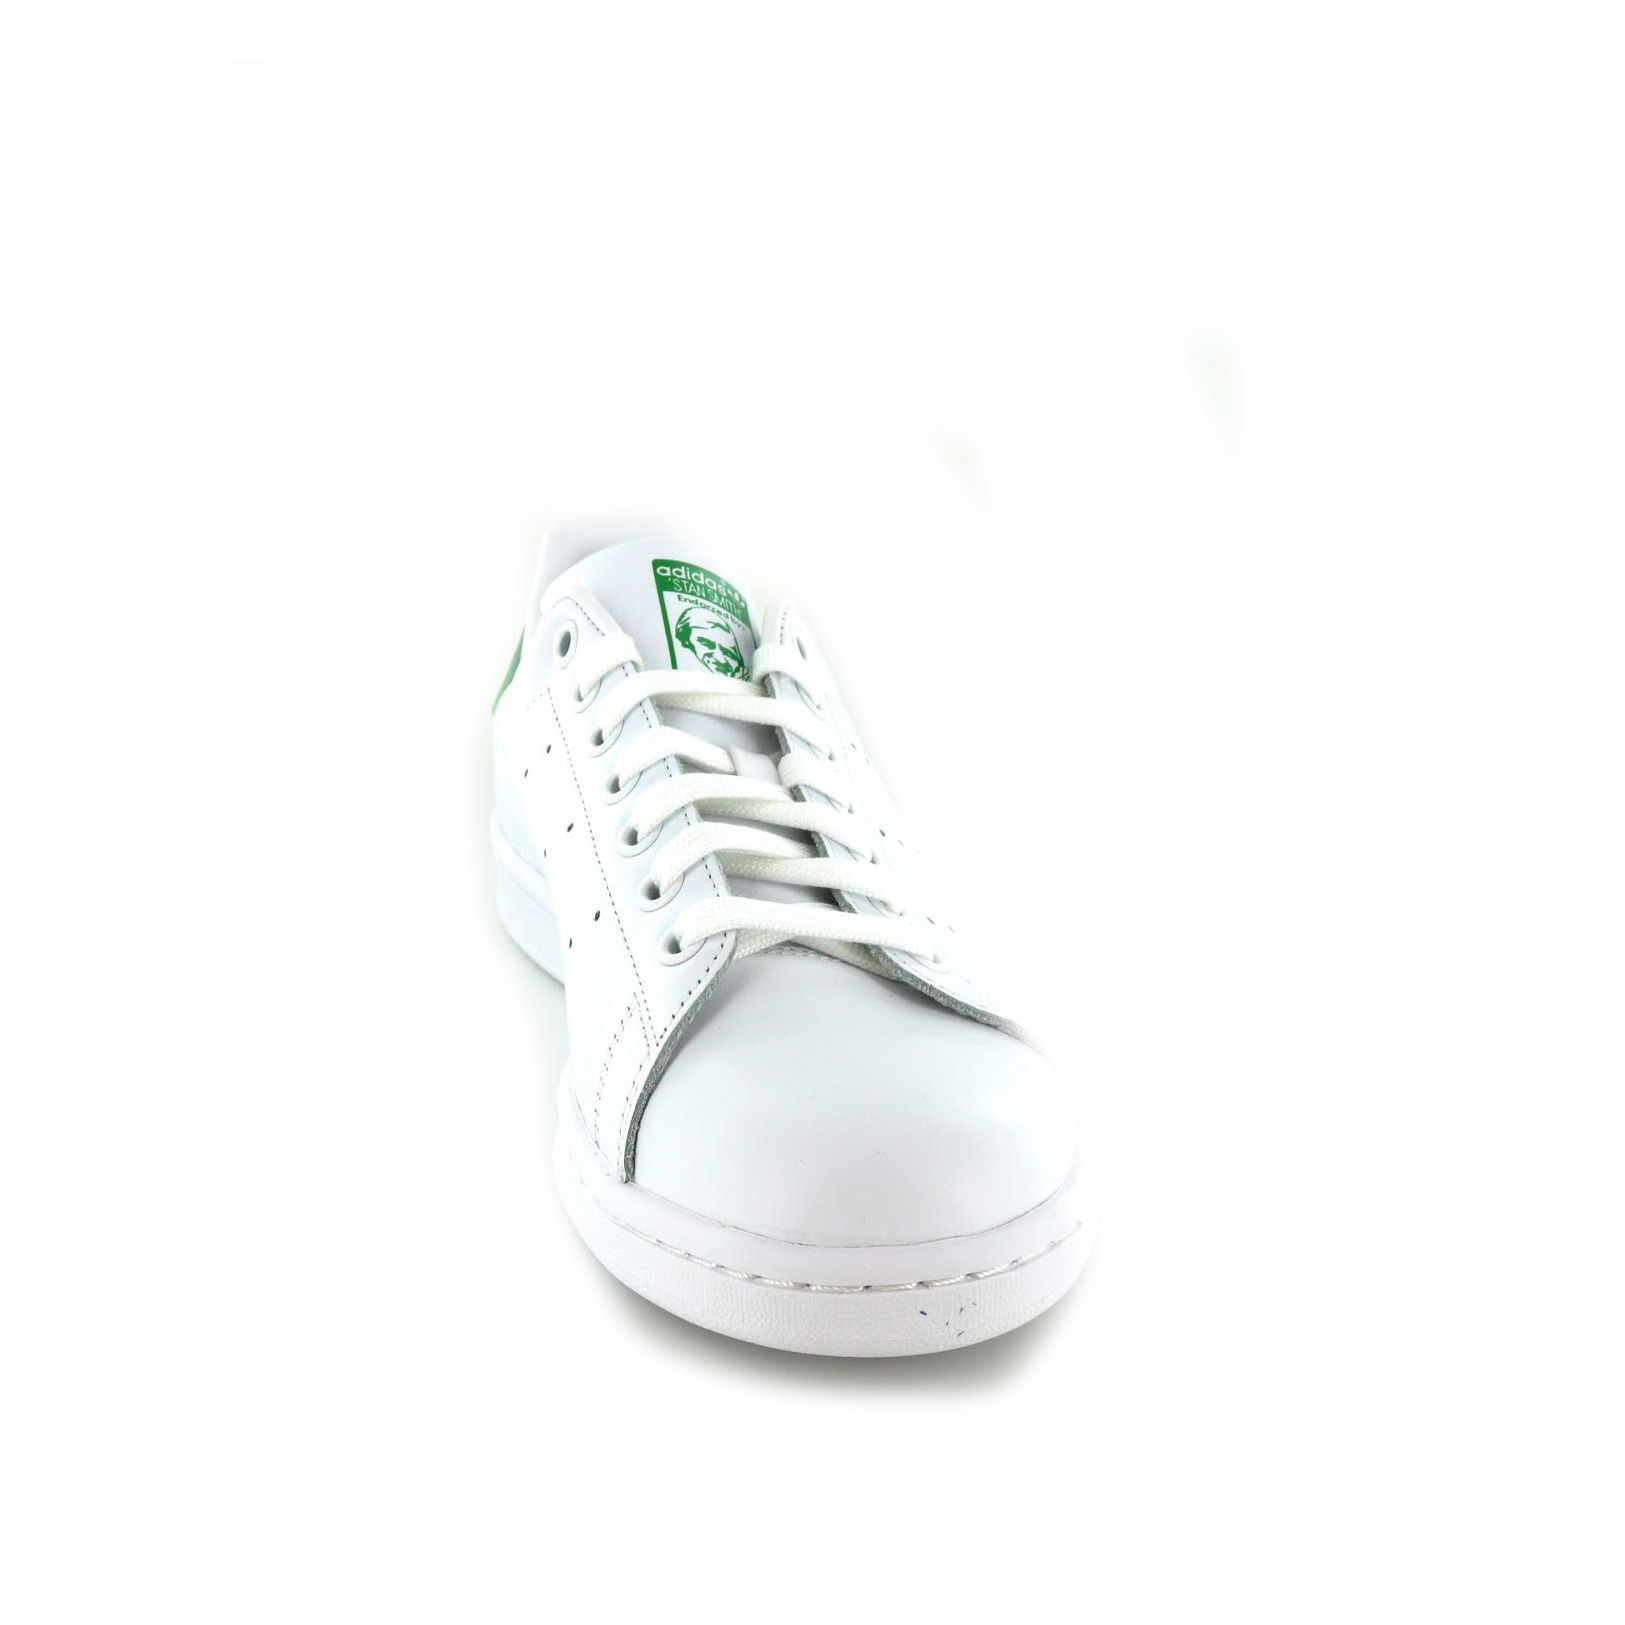 Adidas / Blonder Sko - Joggesko, Hvit